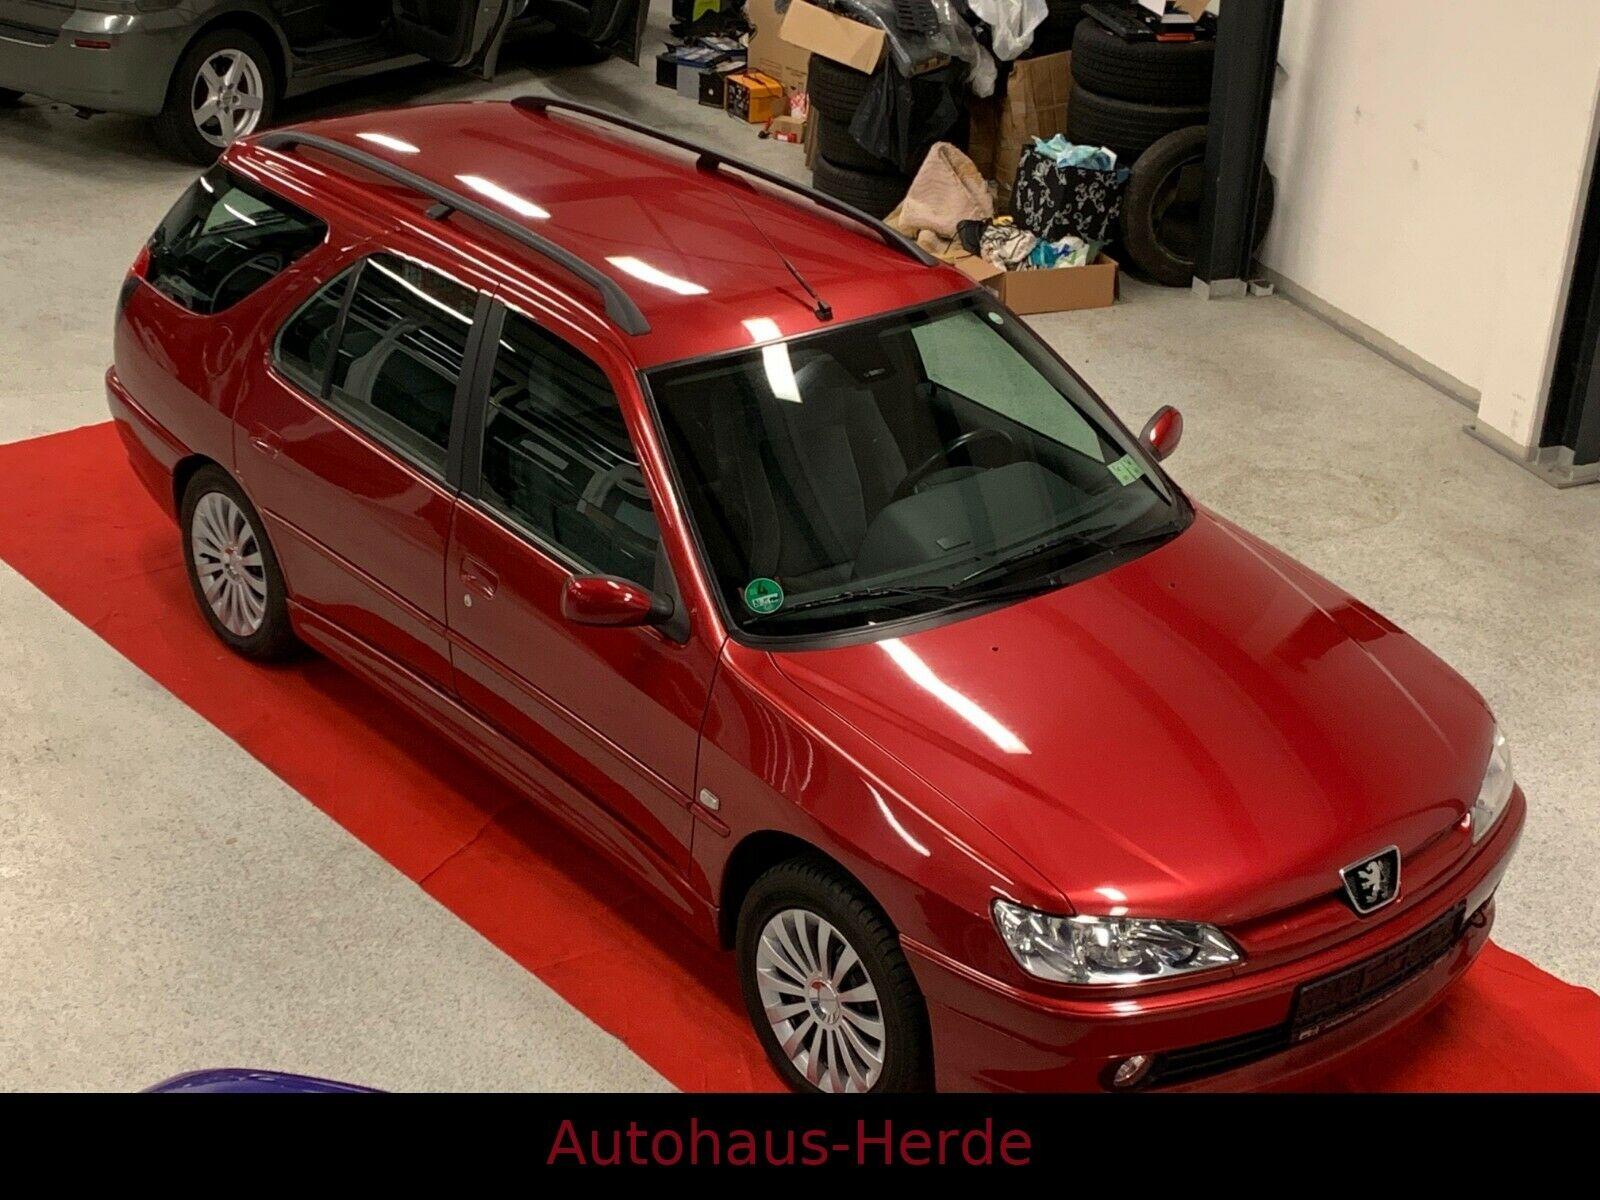 PEUGEOT 306 Premium 100 Automatik -1. Hand -Erst 99.850